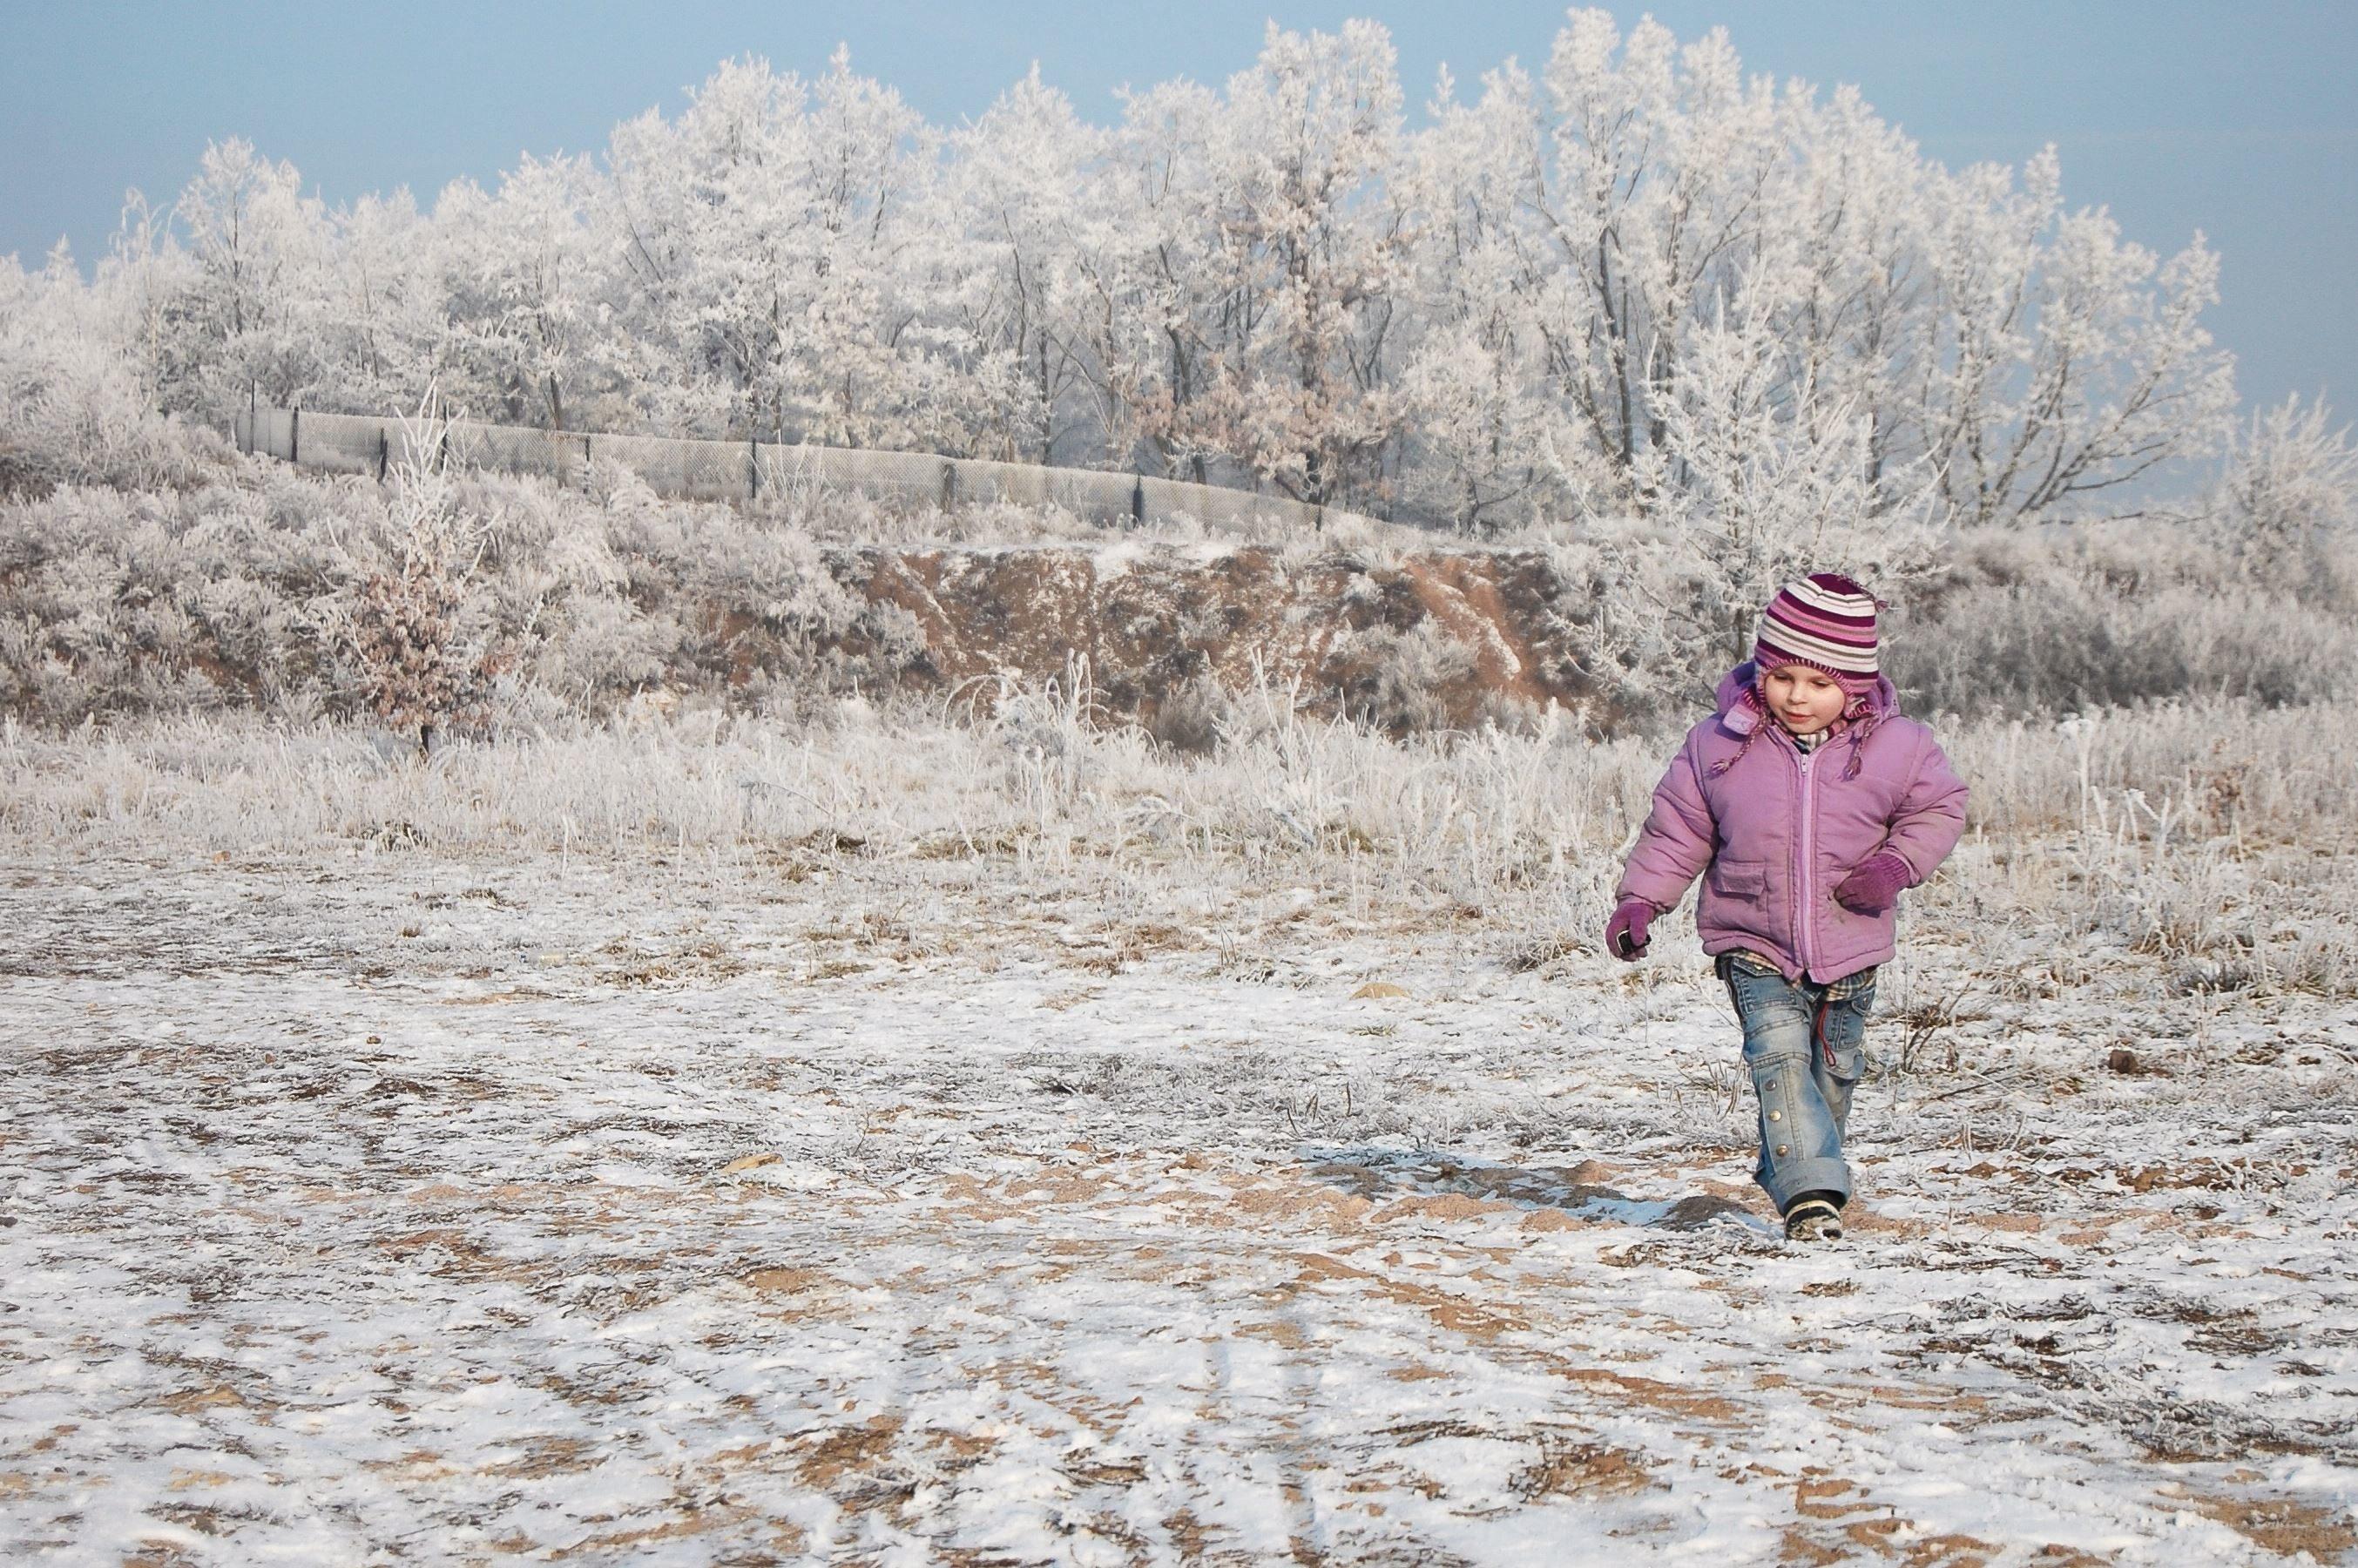 Free picture child tree winter snow cold hat landscape